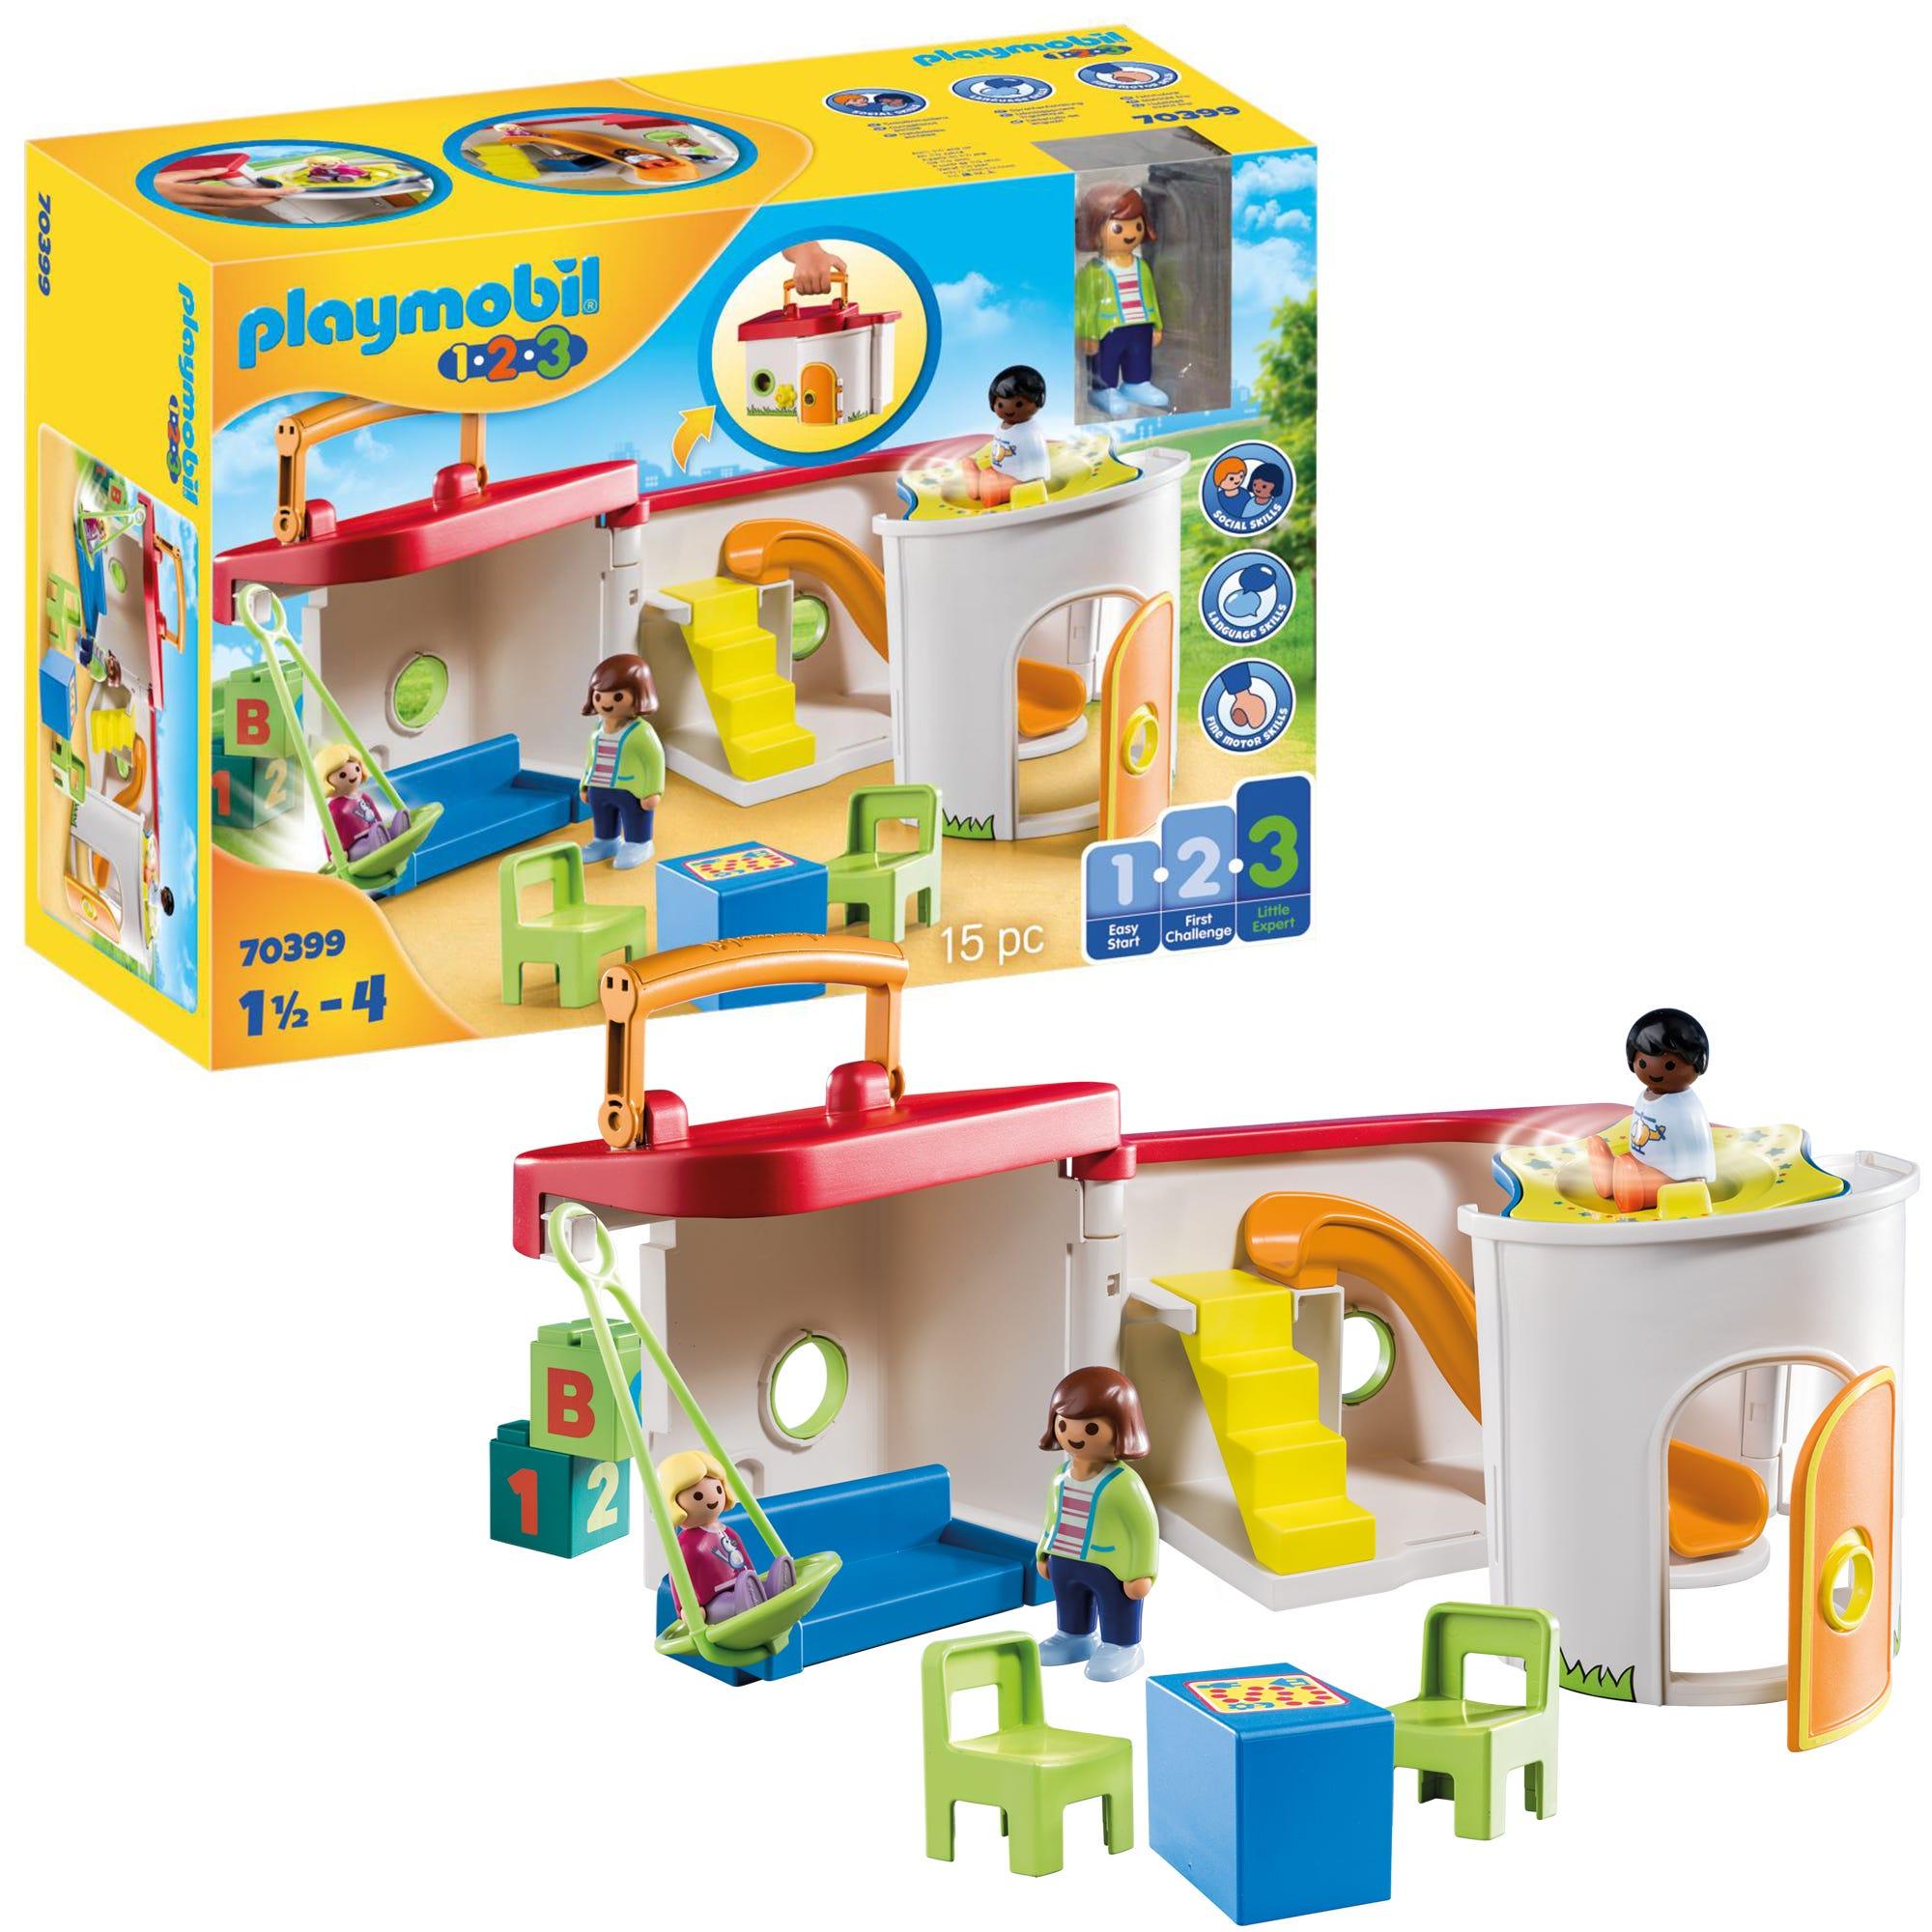 Playmobil 1.2.3 70399 My Take Along Preschool For 18+ Months